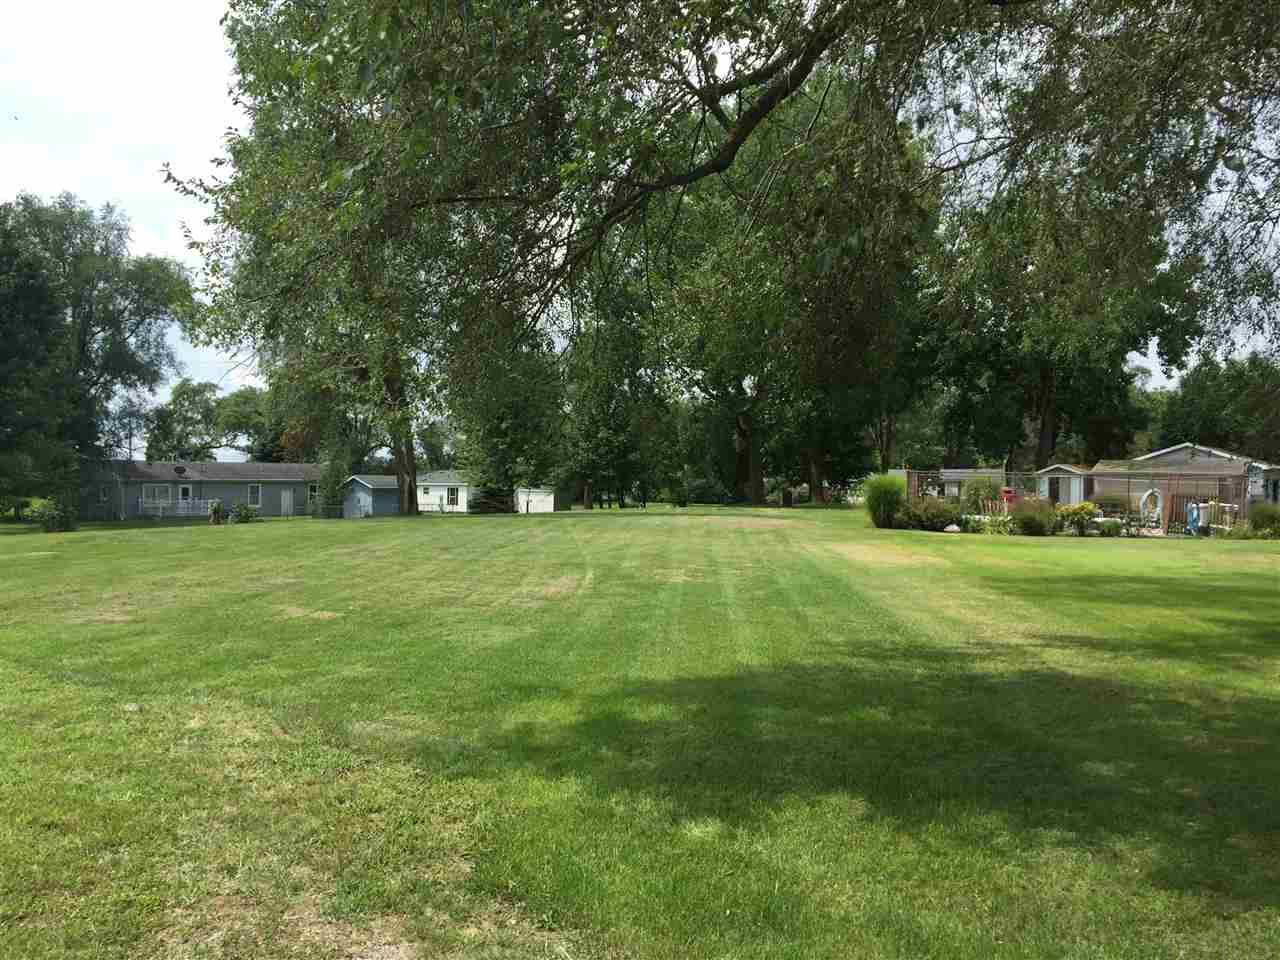 N Lake Shore Ct., Monticello, IN 47960